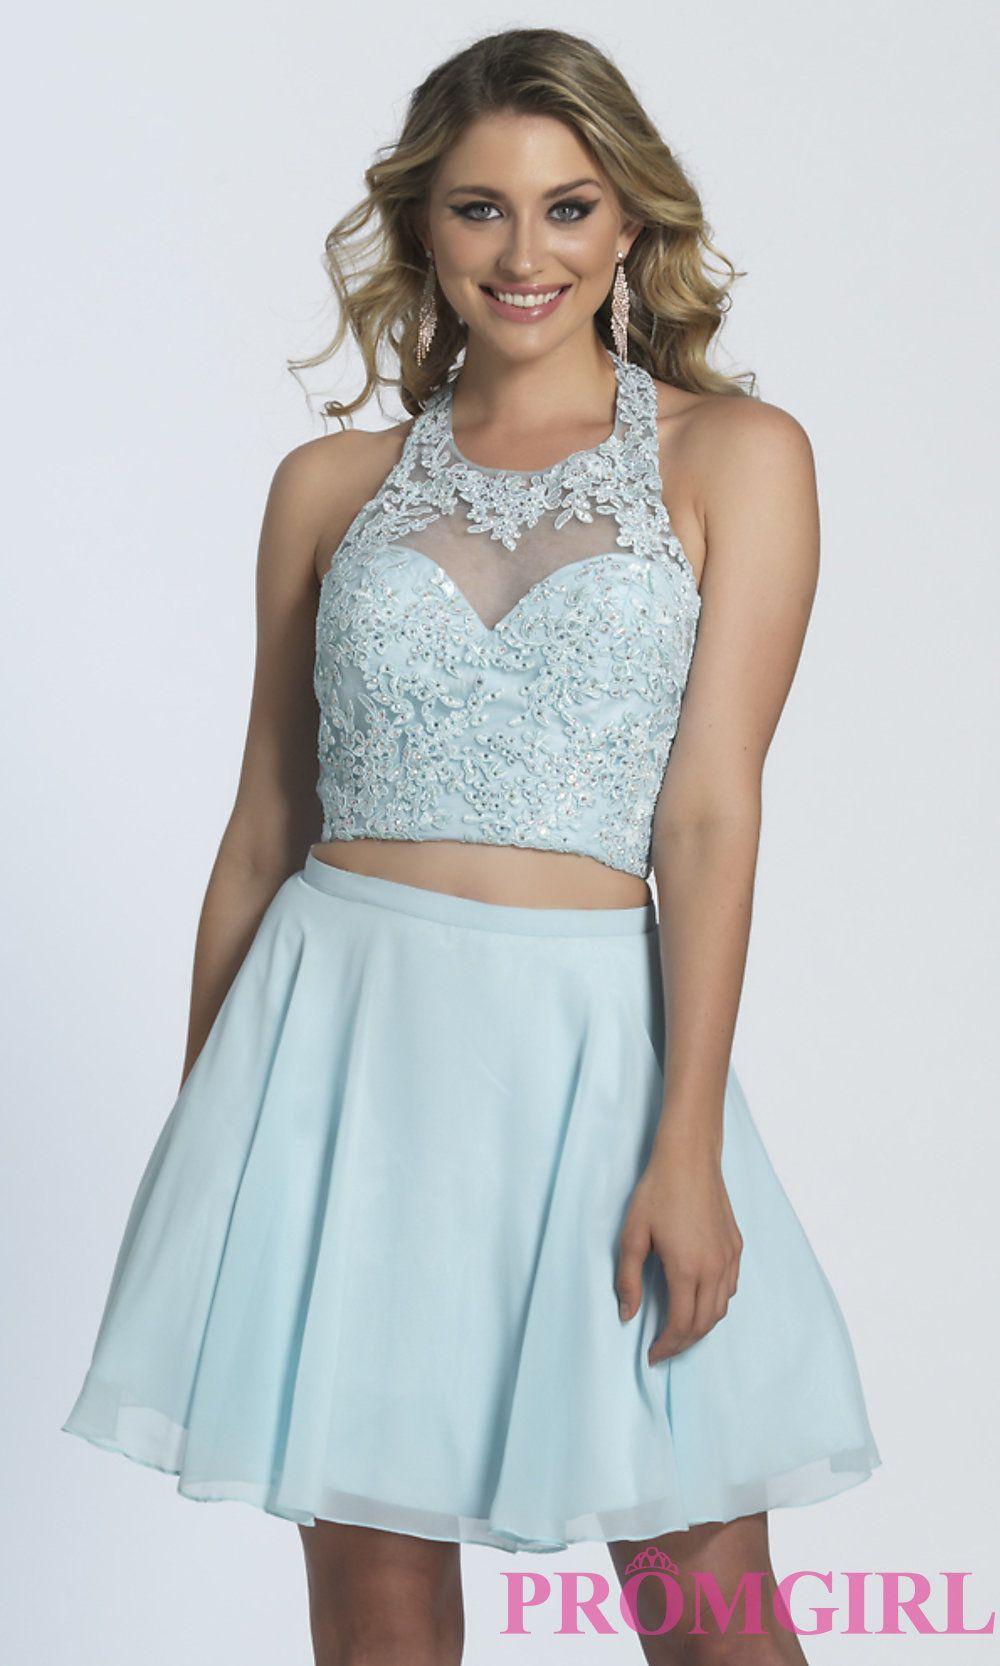 Under 100 Dollar Dress Two Piece Short Ice Blue Prom Dress Prom